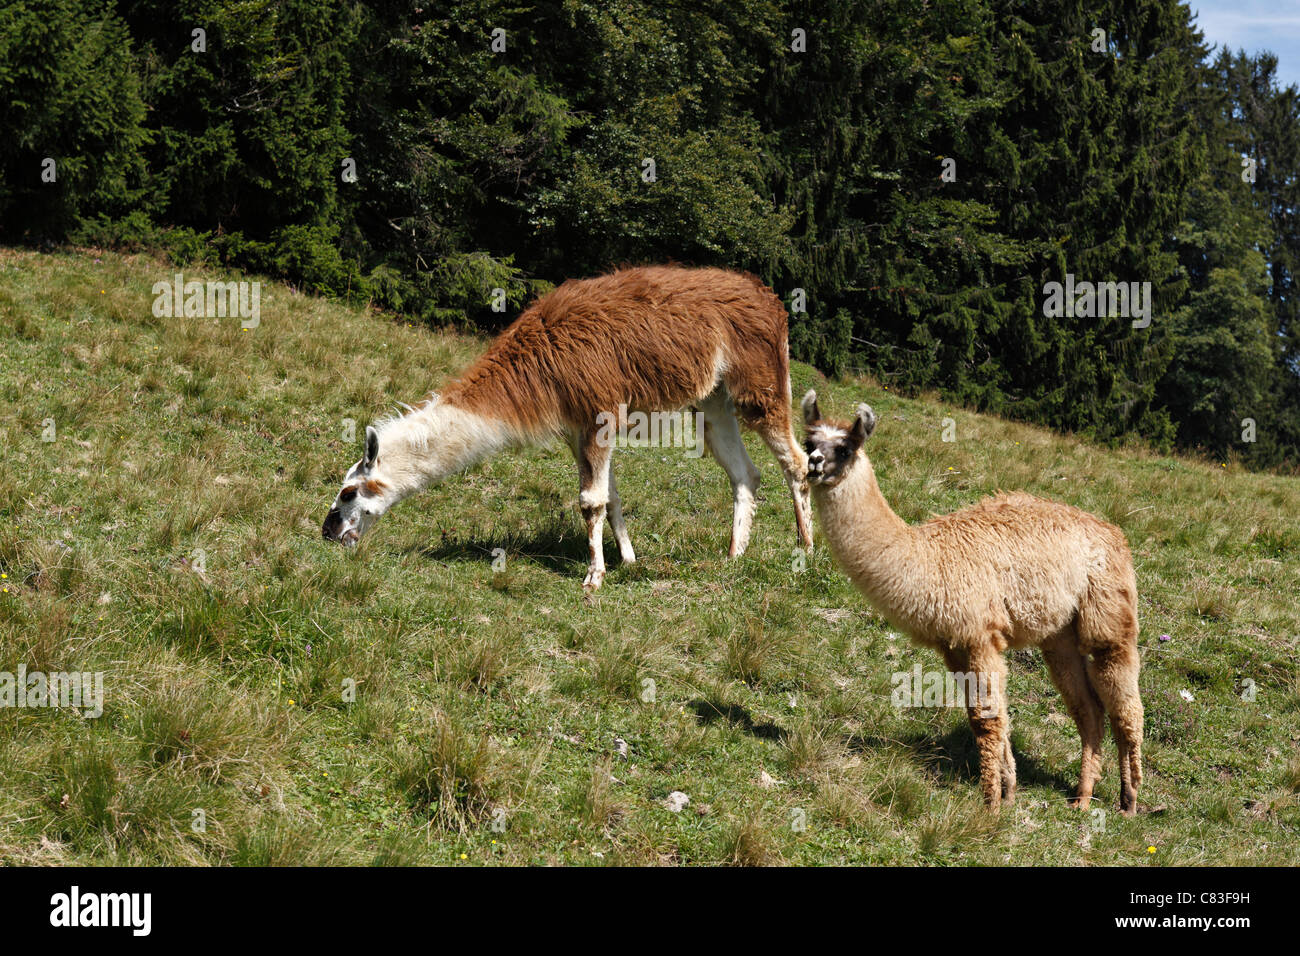 Alpacas ( Lama pacos ) in the Taubensee Alps, Chiemgau Upper Bavaria Germany - Stock Image